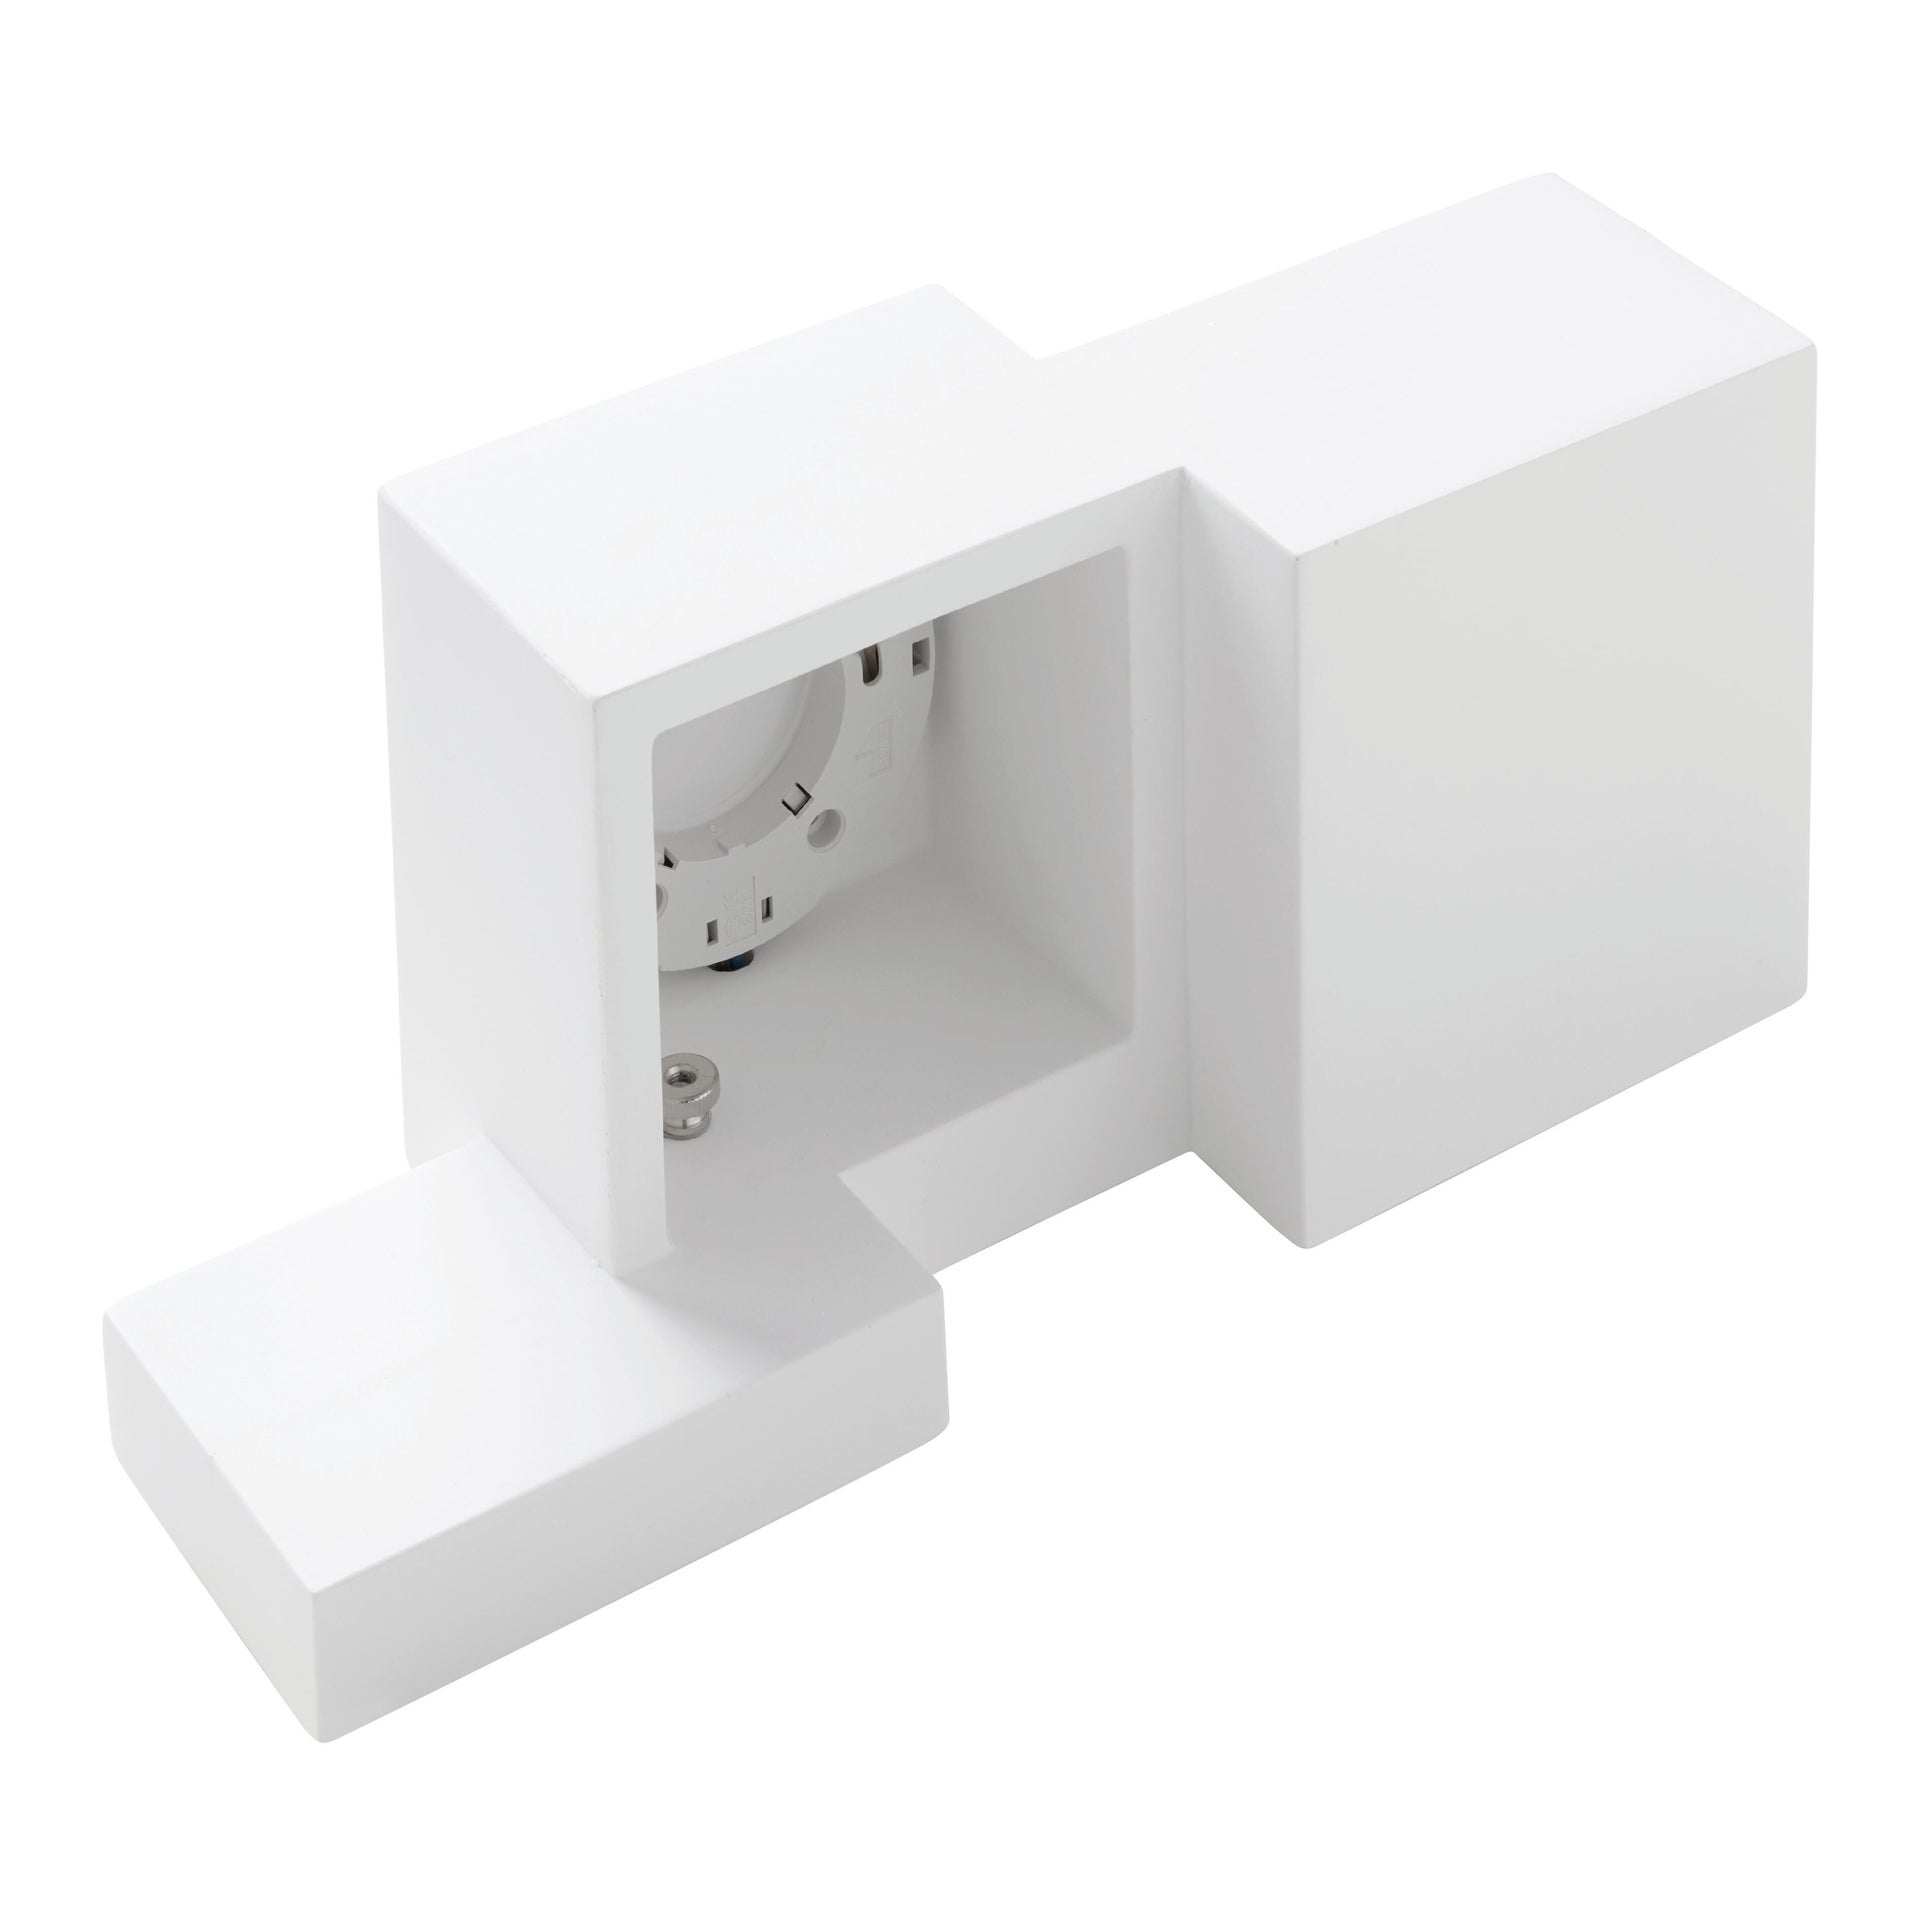 Applique SIDE SMALL bianco, in gesso, 2 luci - 13